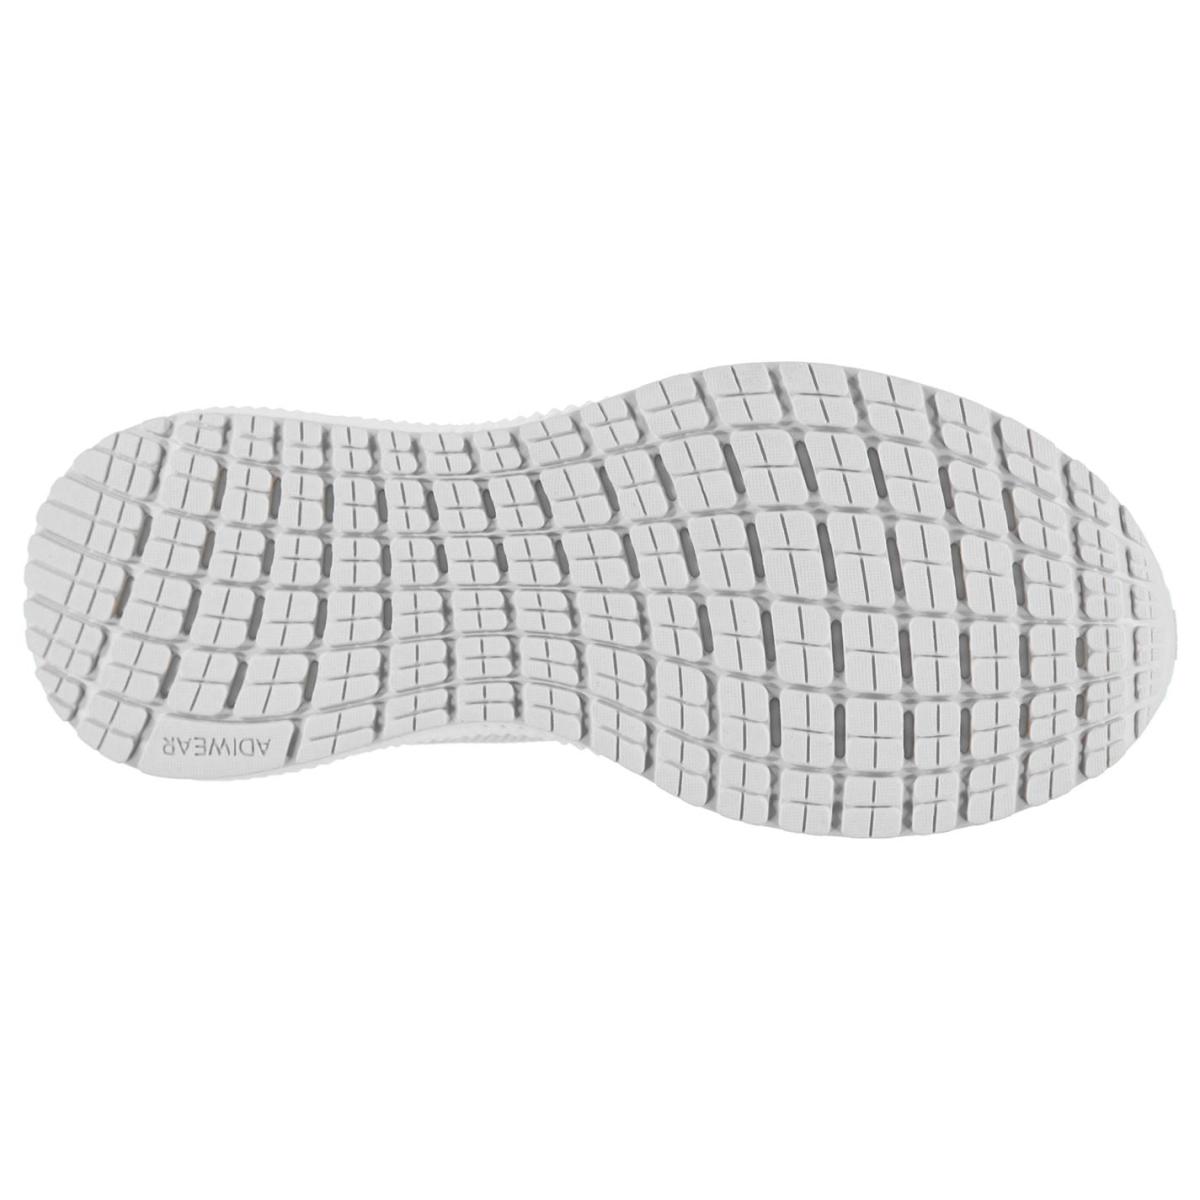 adidas-Solar-Ride-Laufschuhe-Damen-Sportschuhe-Turnschuhe-Jogging-4136 Indexbild 9